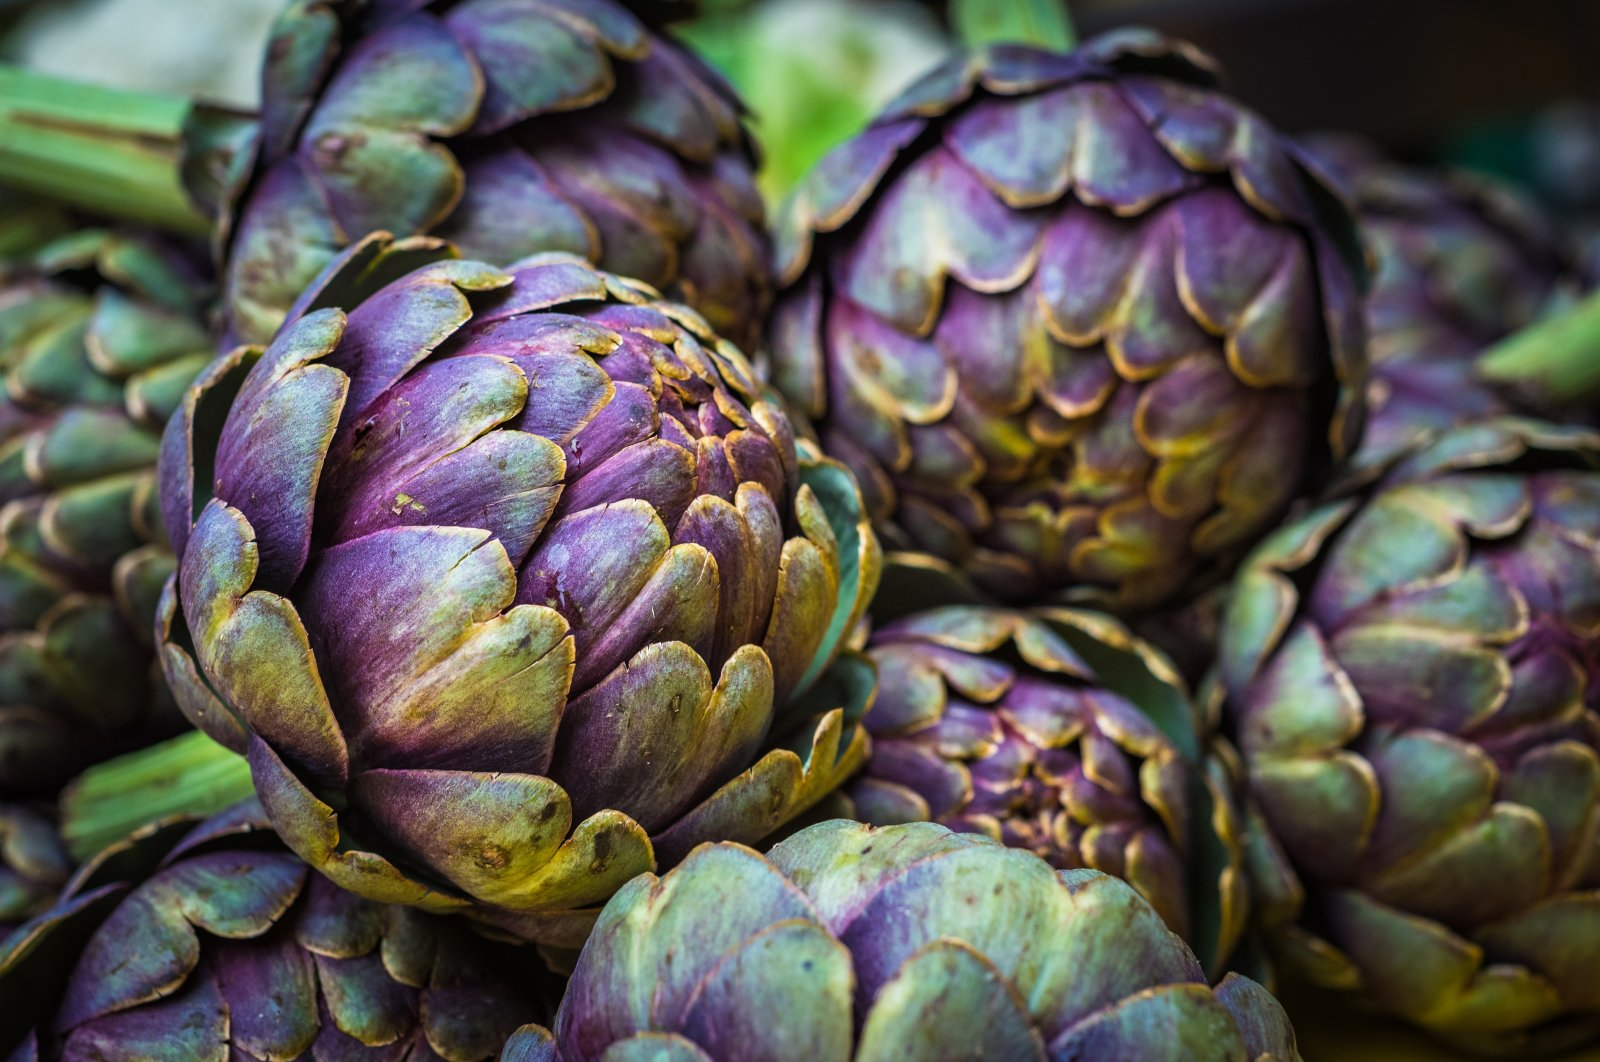 Fresh artichokes at a farmers market. (Shutterstock Photo)